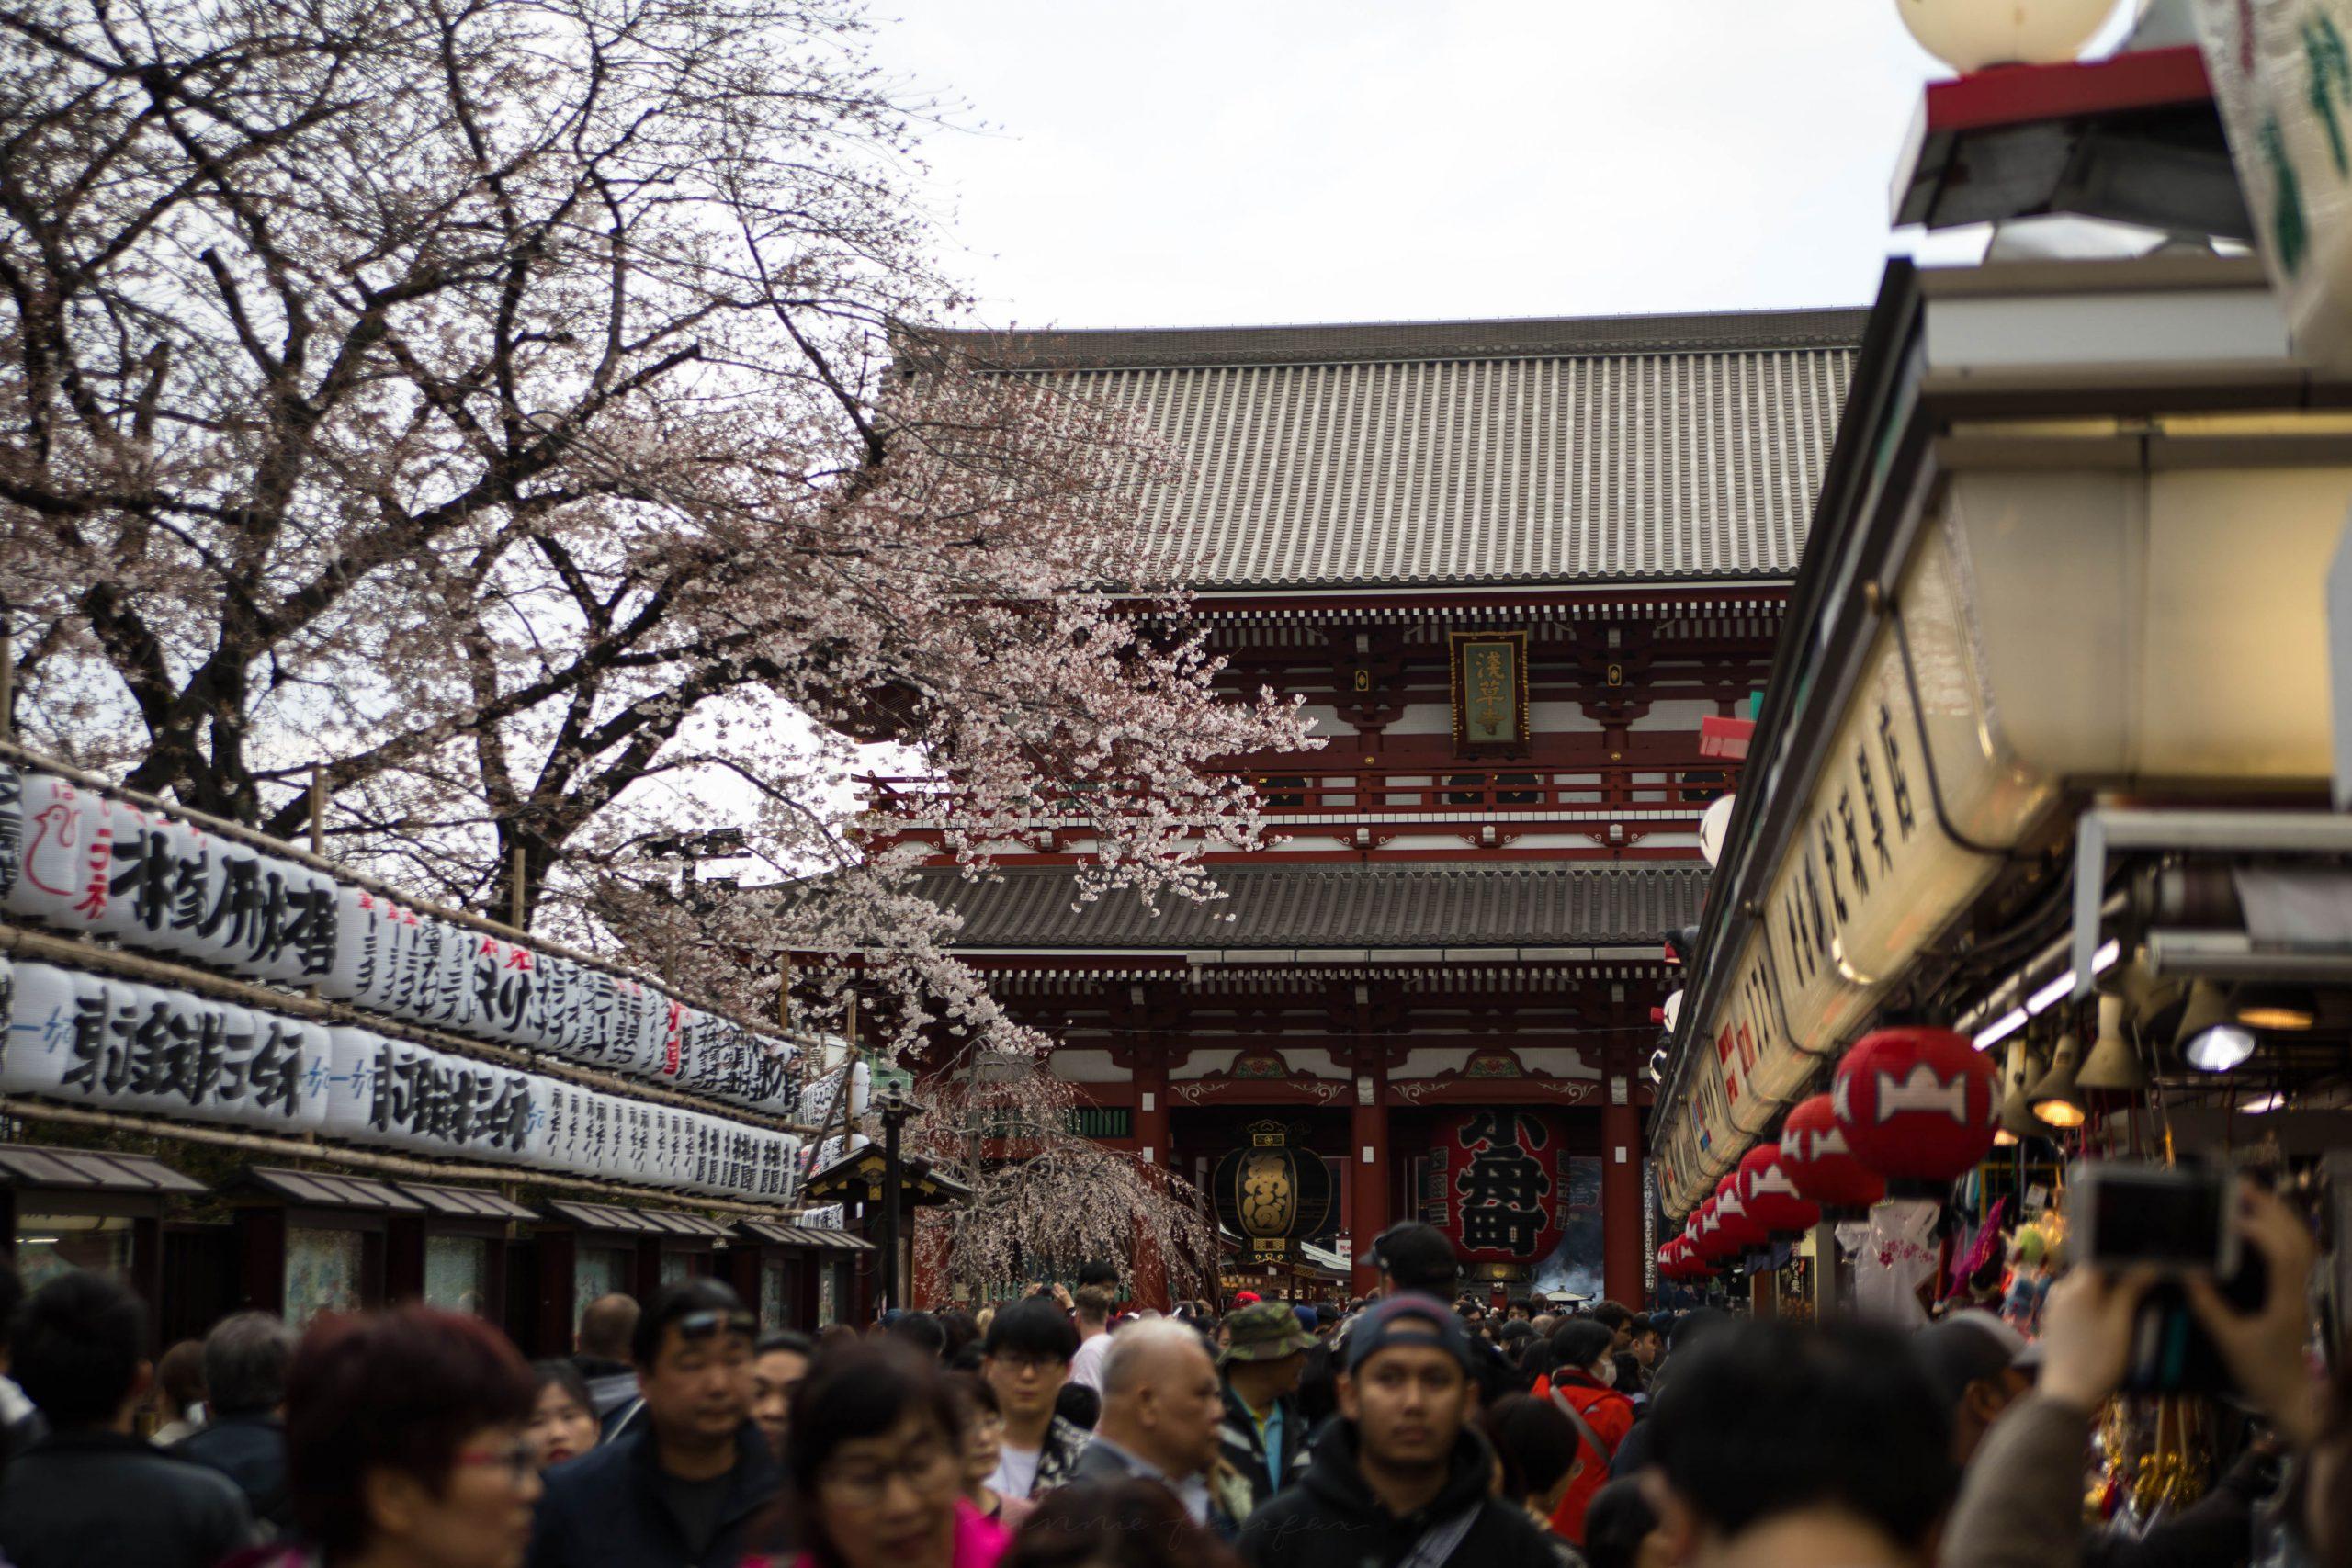 Temple Sales Area at Sensoji-Temple in Asakusa Tokyo Japan by Annie Fairfax